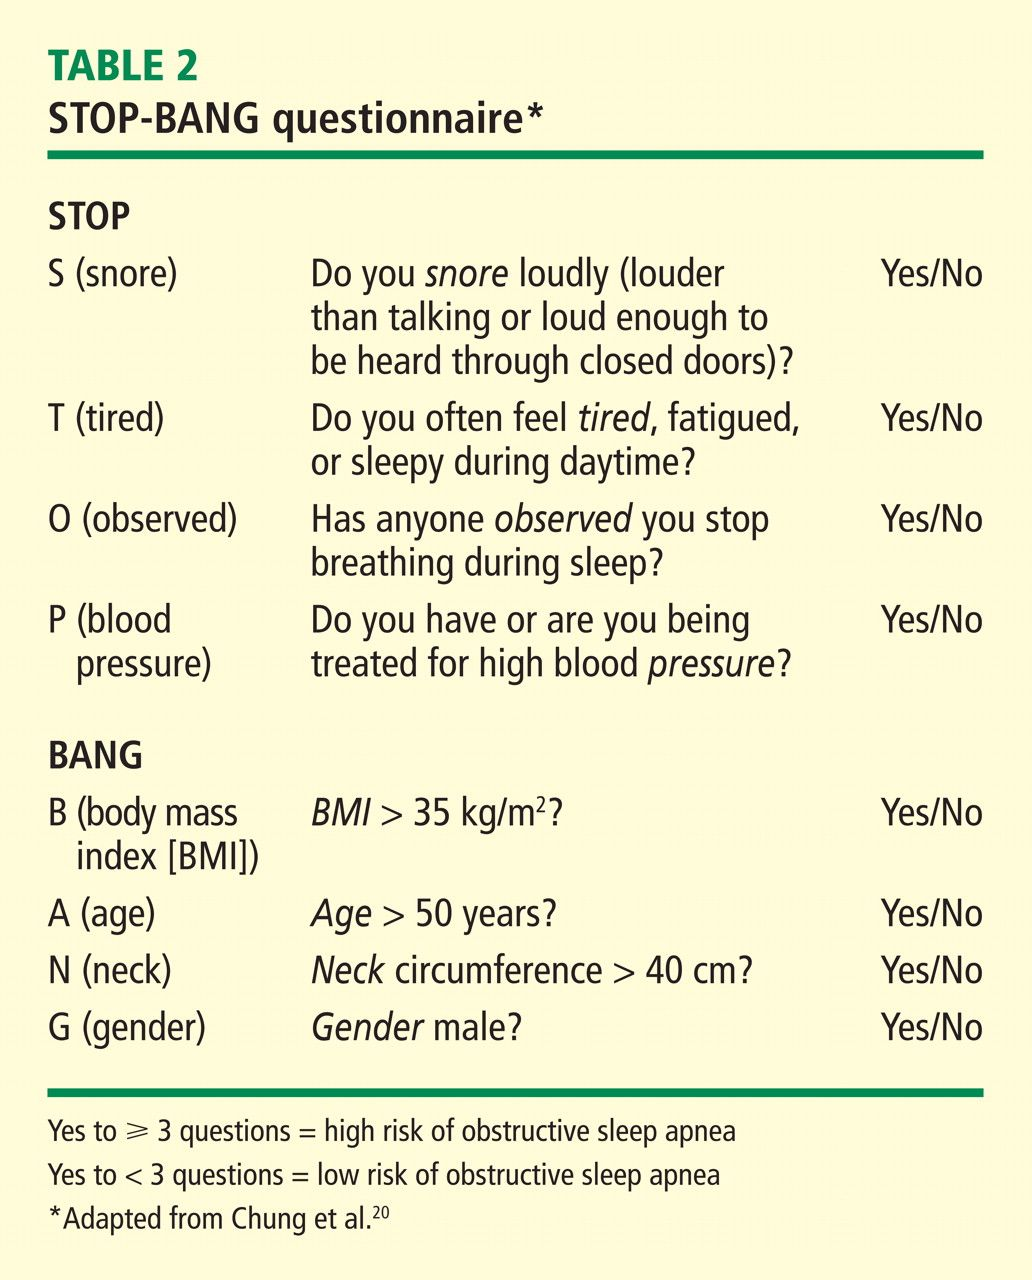 How Do You Determine the Severity of Sleep Apnea - See ... |Sleep Apnea Questionnaire Screening